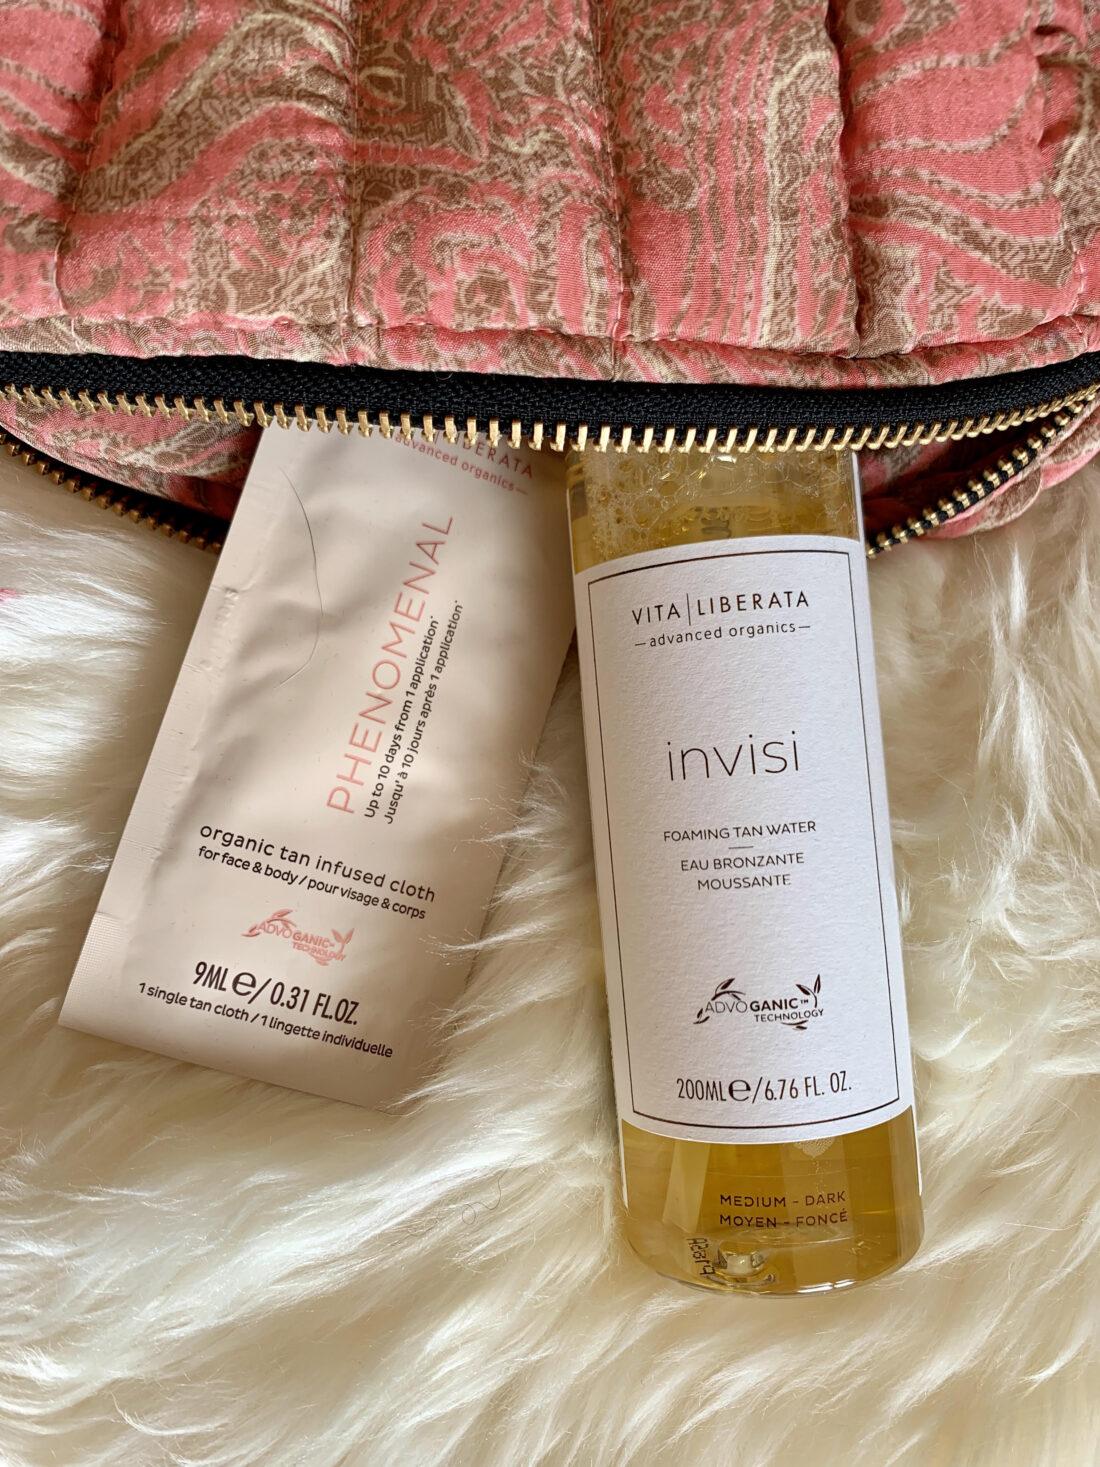 Vita Liberata, Selvbruner, Organic Tan Infused Cloth, Invisi Foamin Tan Water, nyhed,